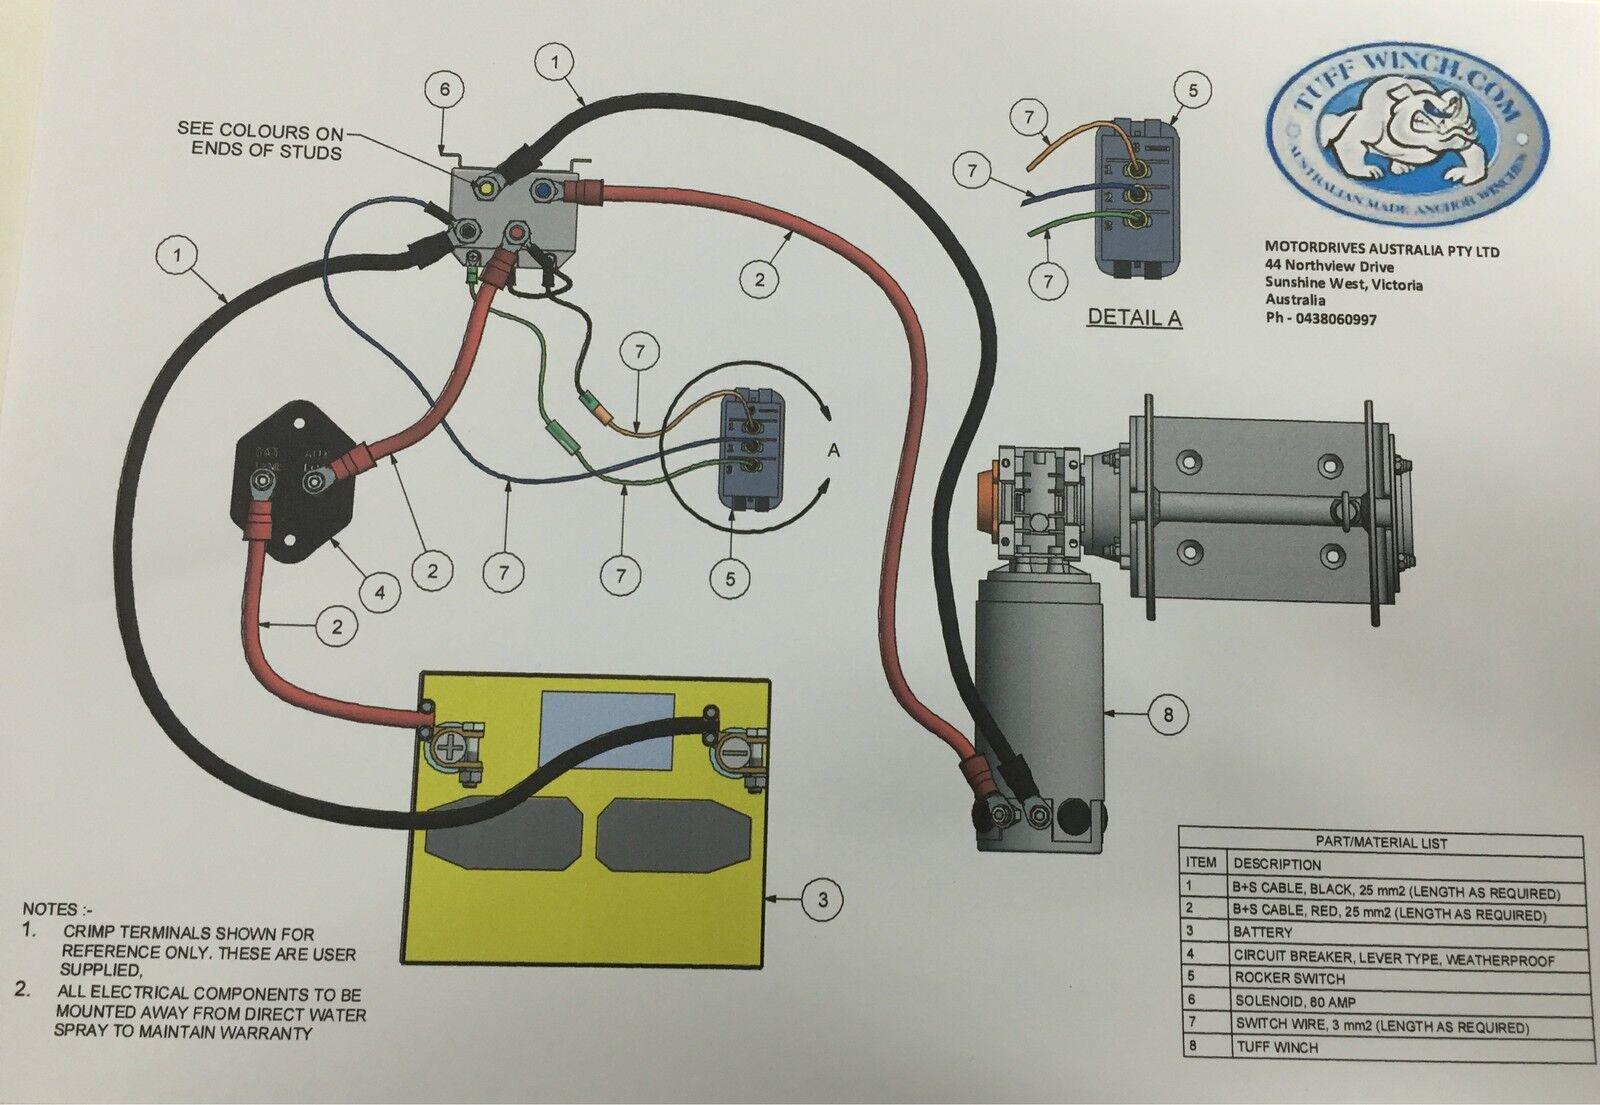 Tuff Tw180 Ebay Stuff Wiring Diagram